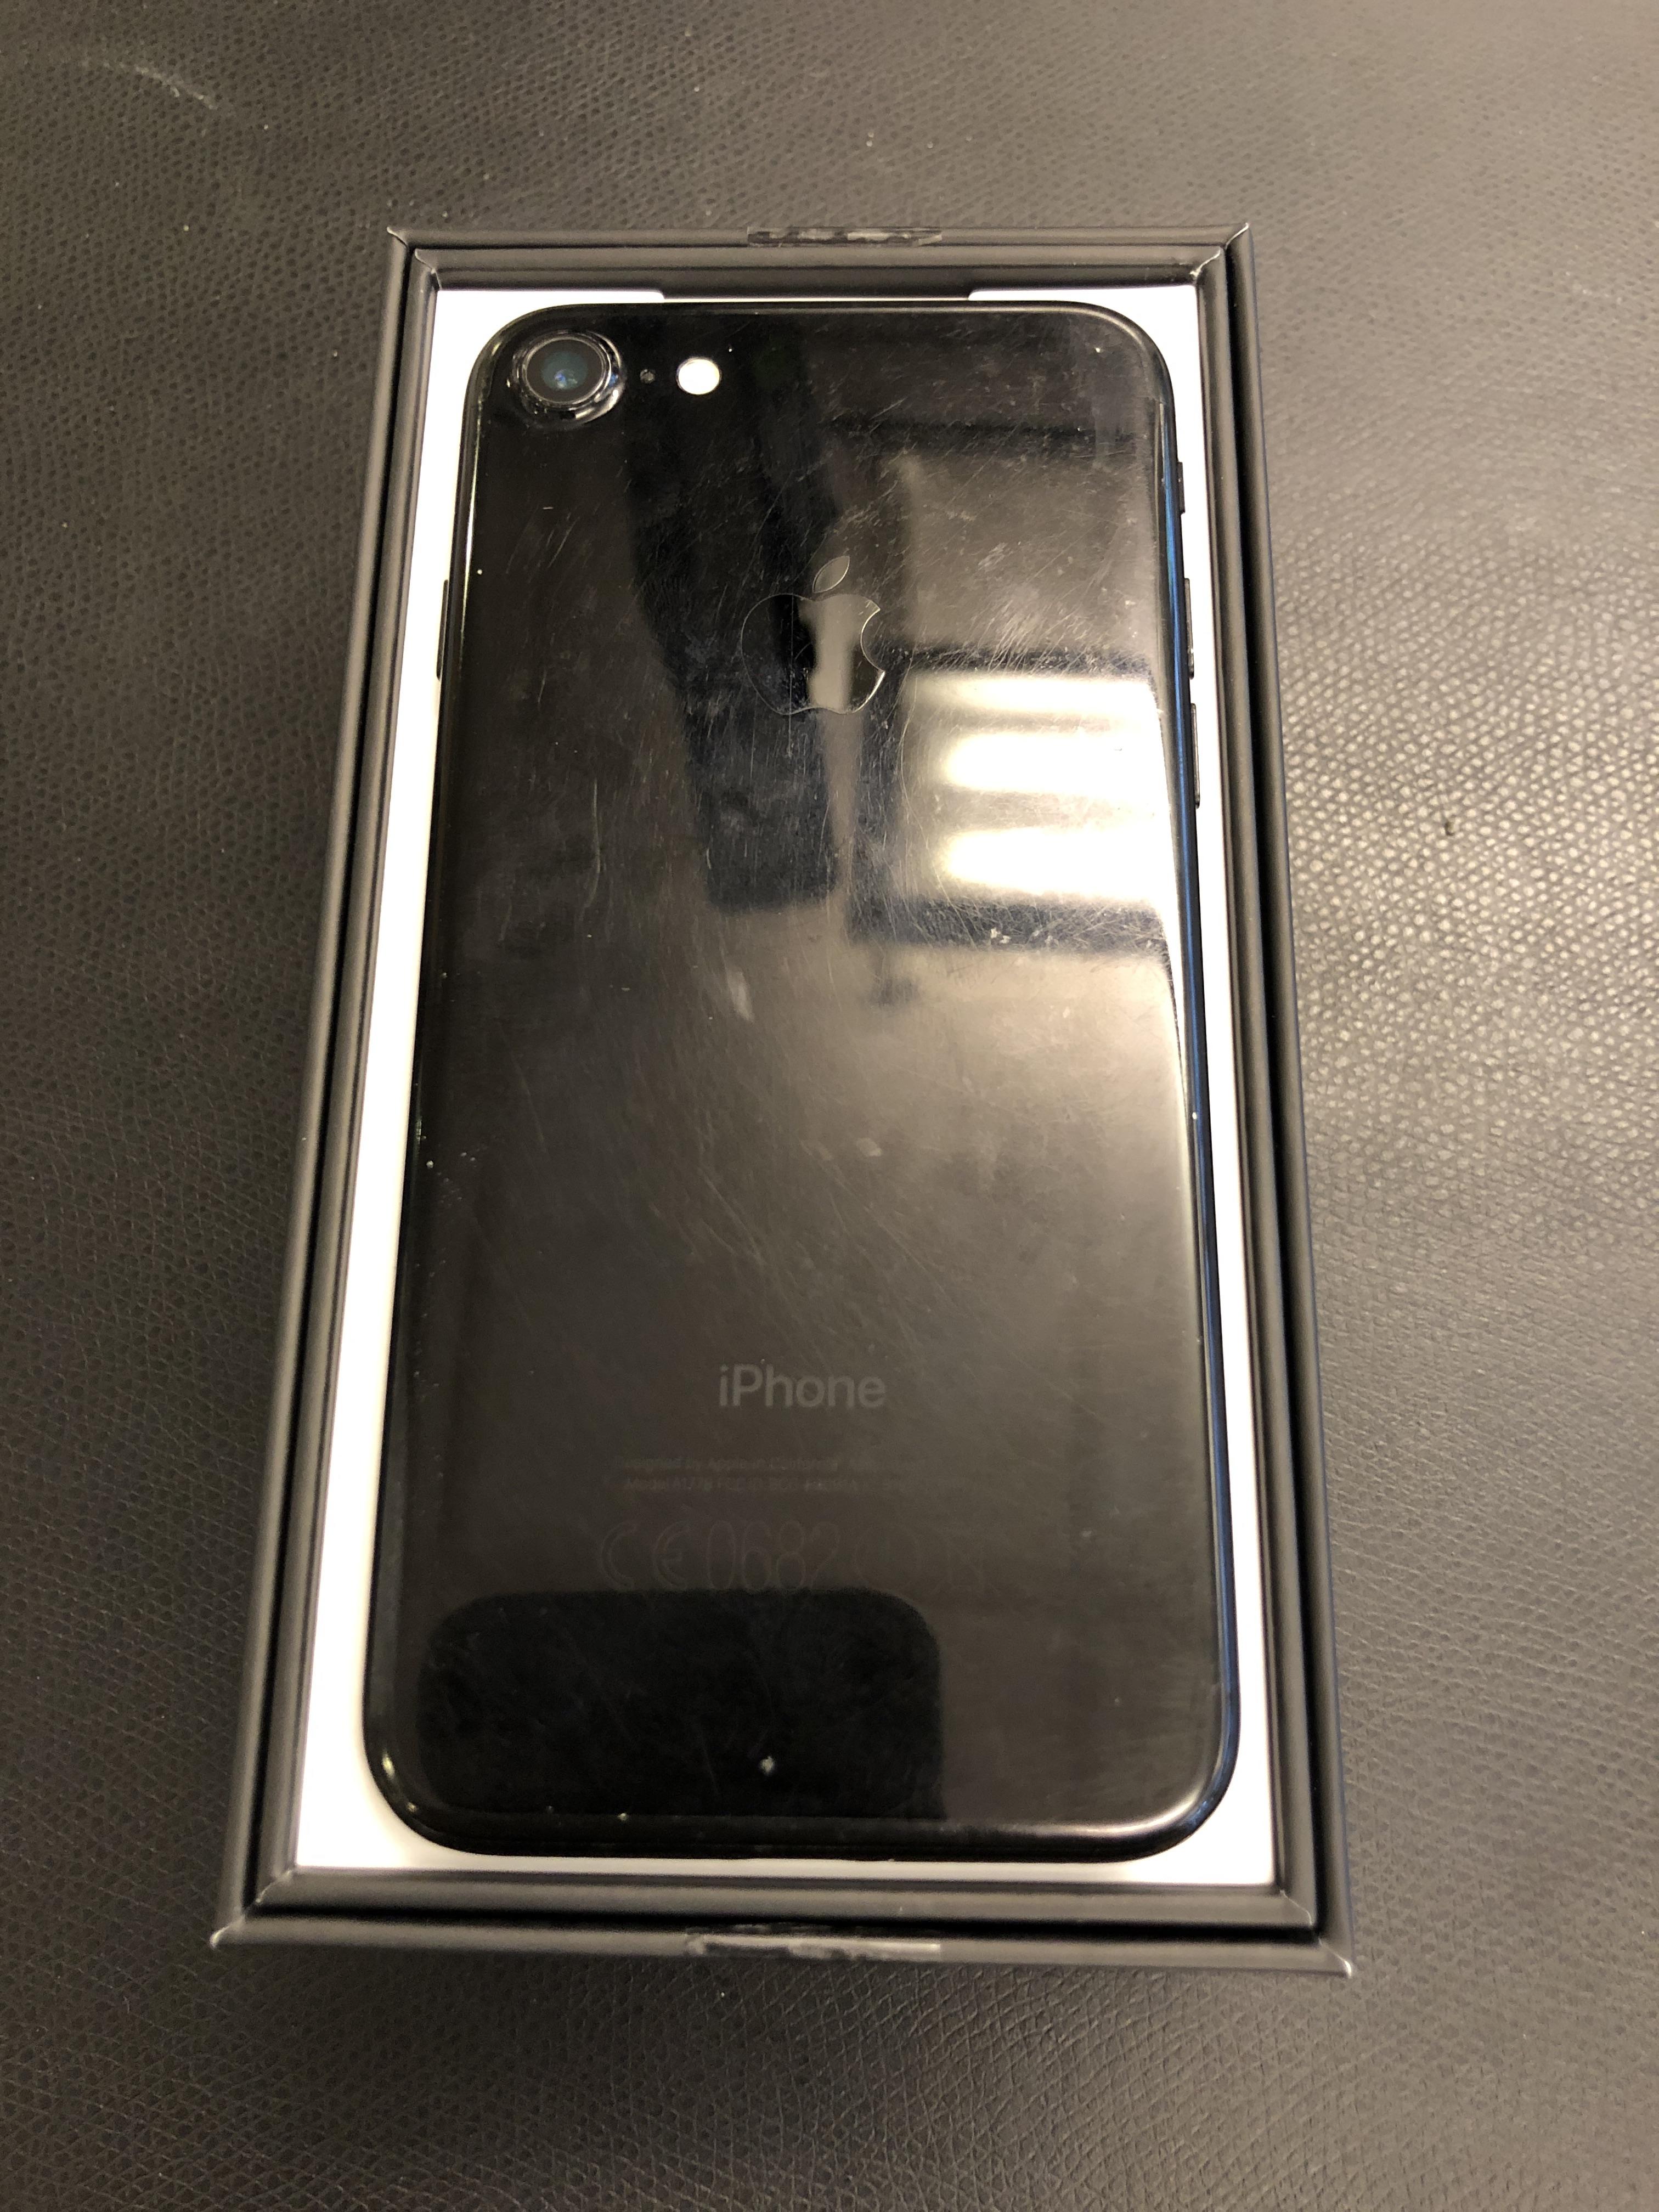 iPhone 7 128GB, 128GB, Jet Black, bild 2